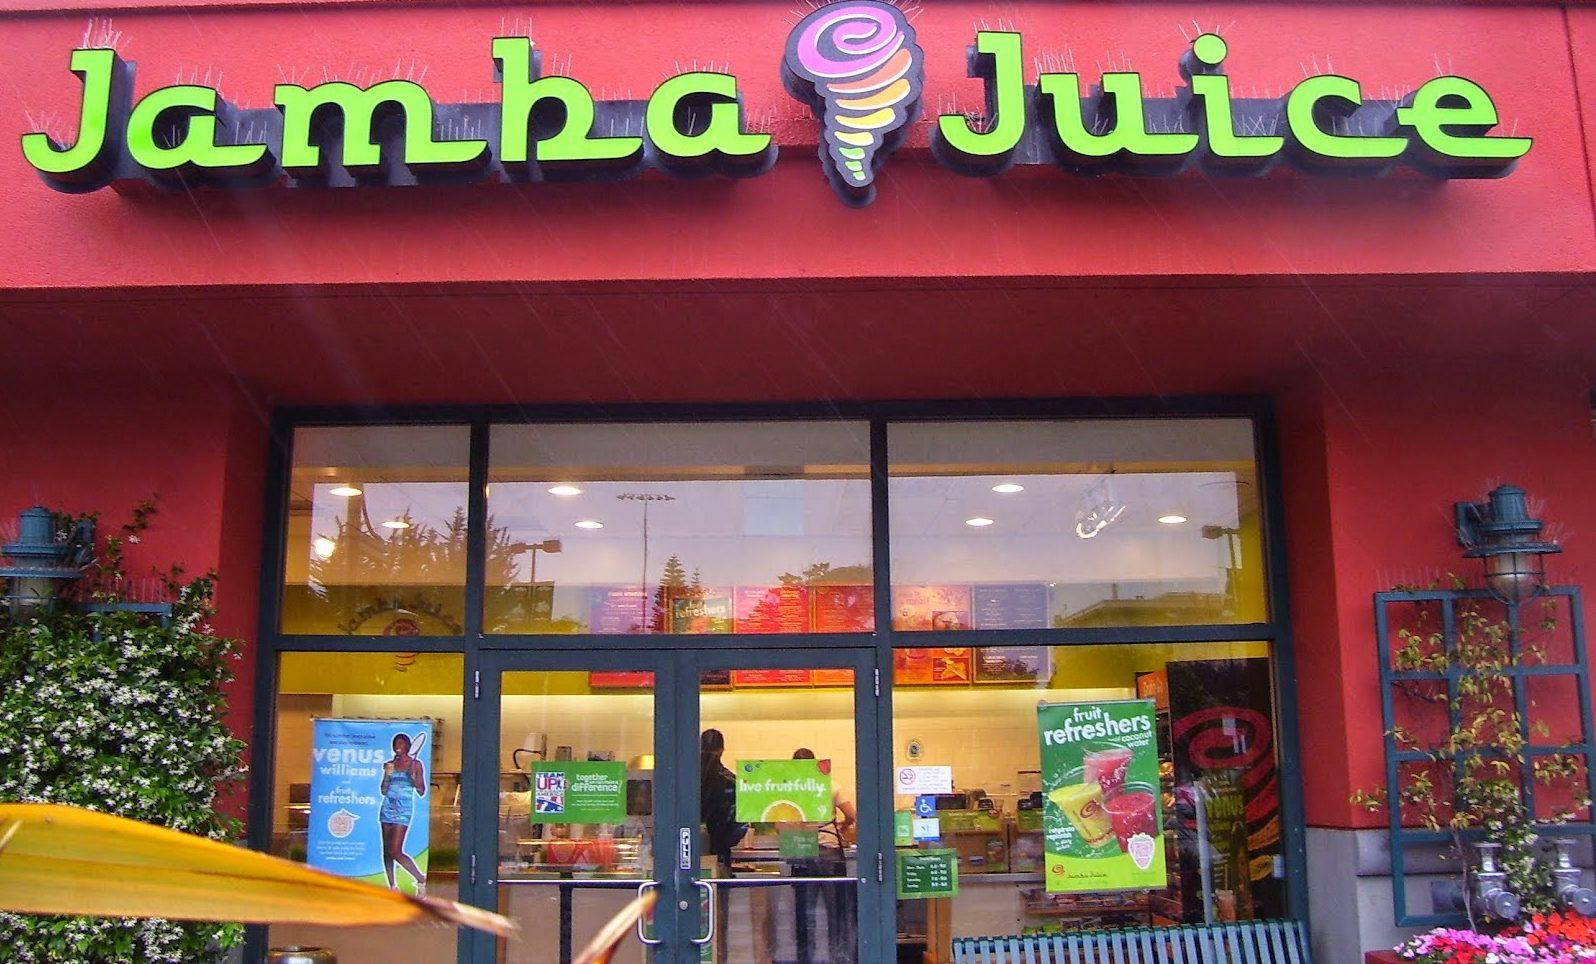 Jamba Juice store front